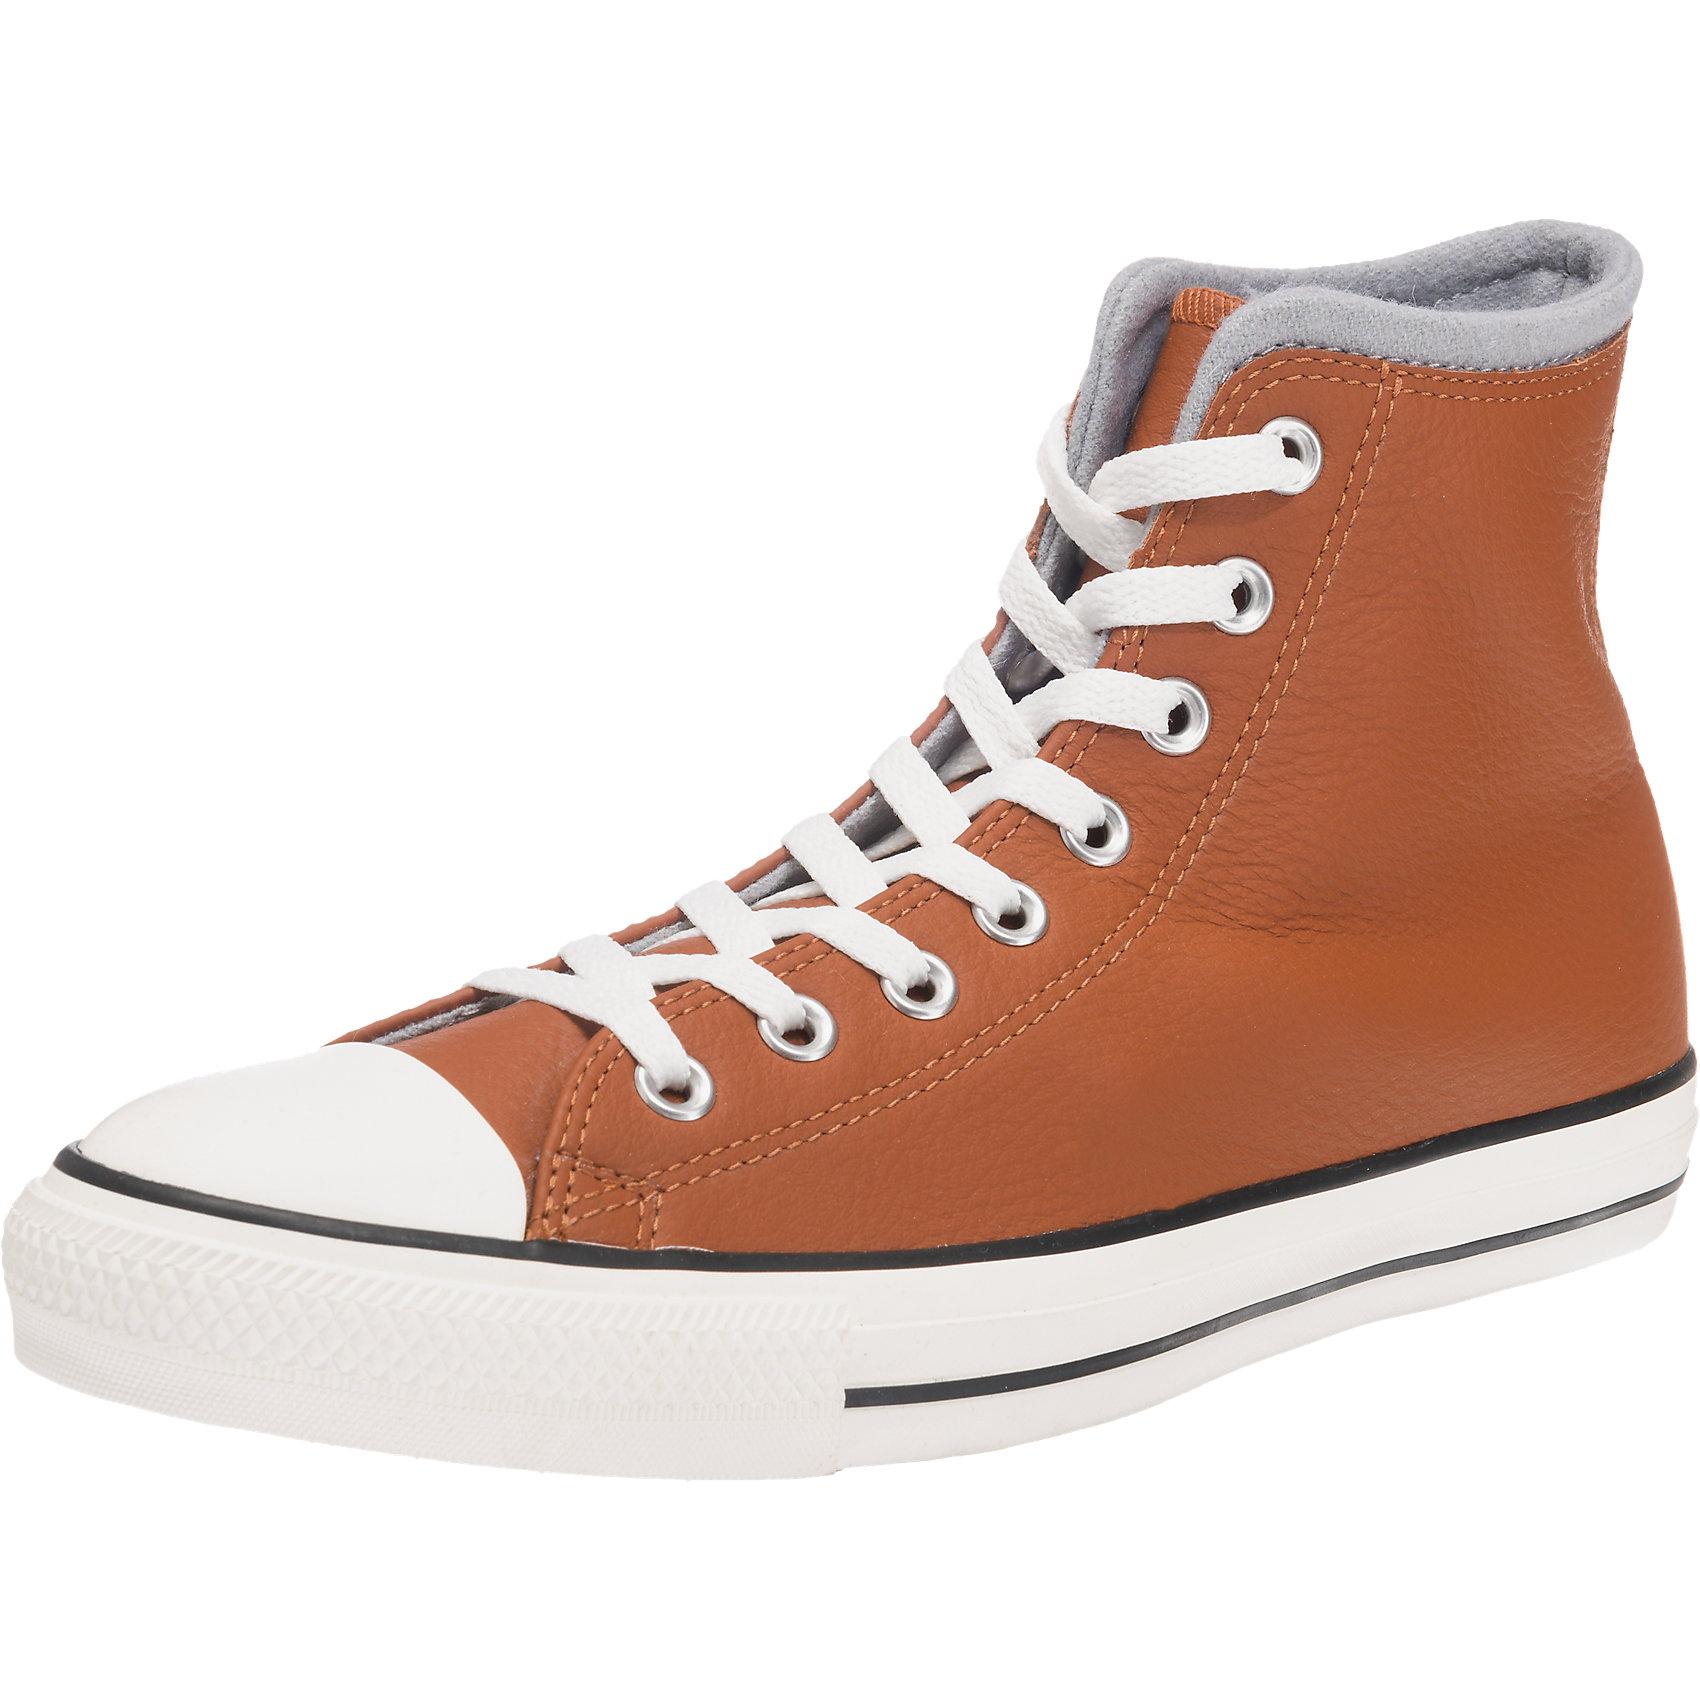 CONVERSE Chuck Taylor All Star Converse Boot Pc Sneakers braun schwarz 5763290